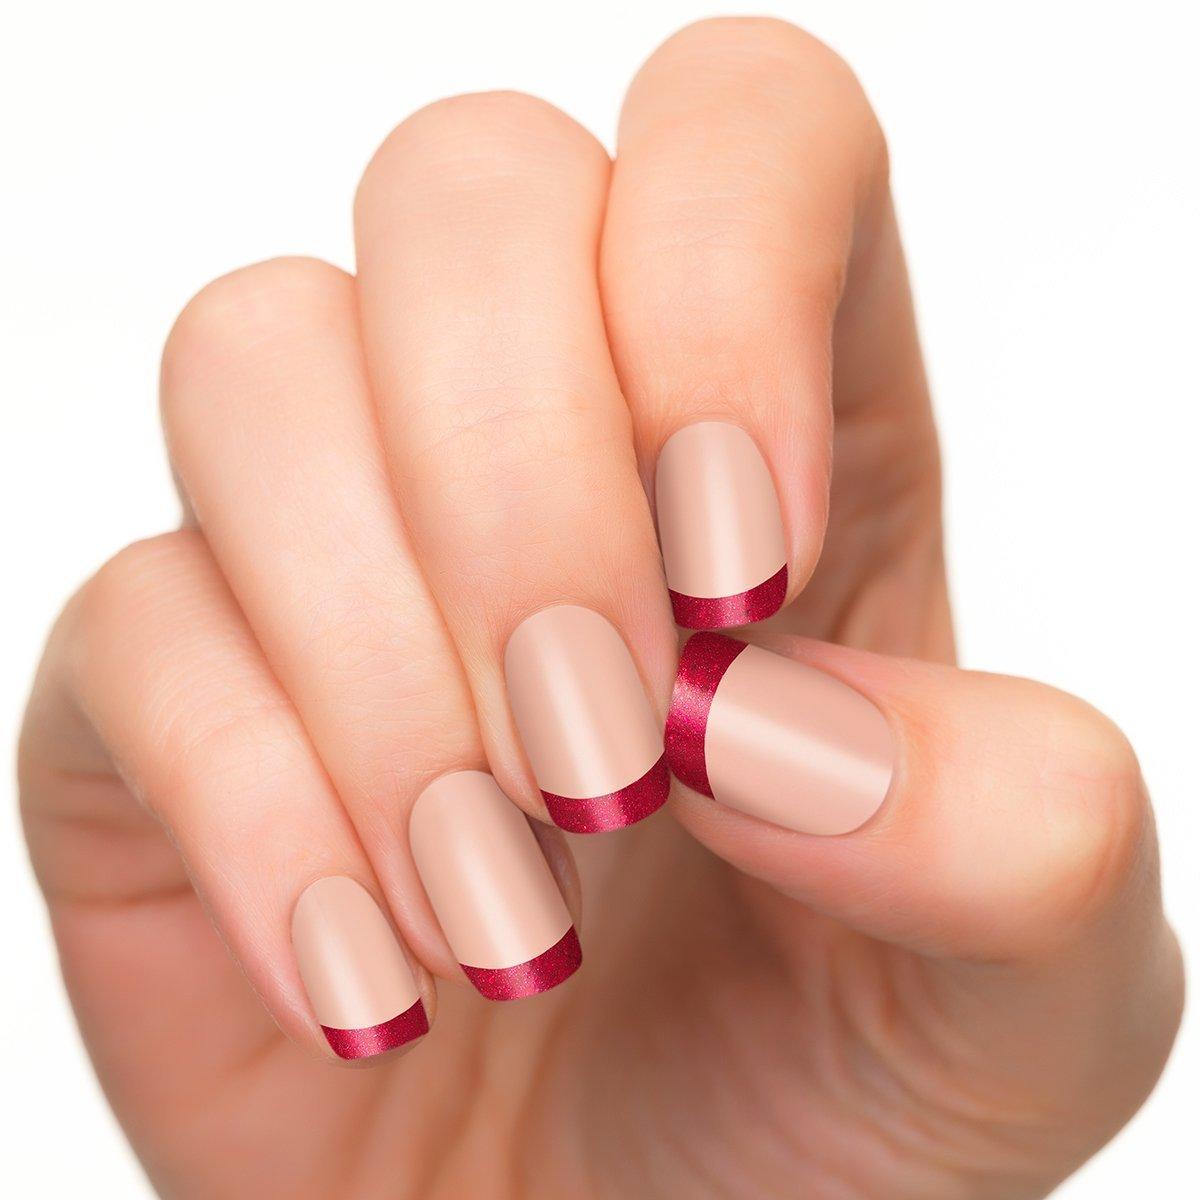 Nailz - для ногтей в Реутове